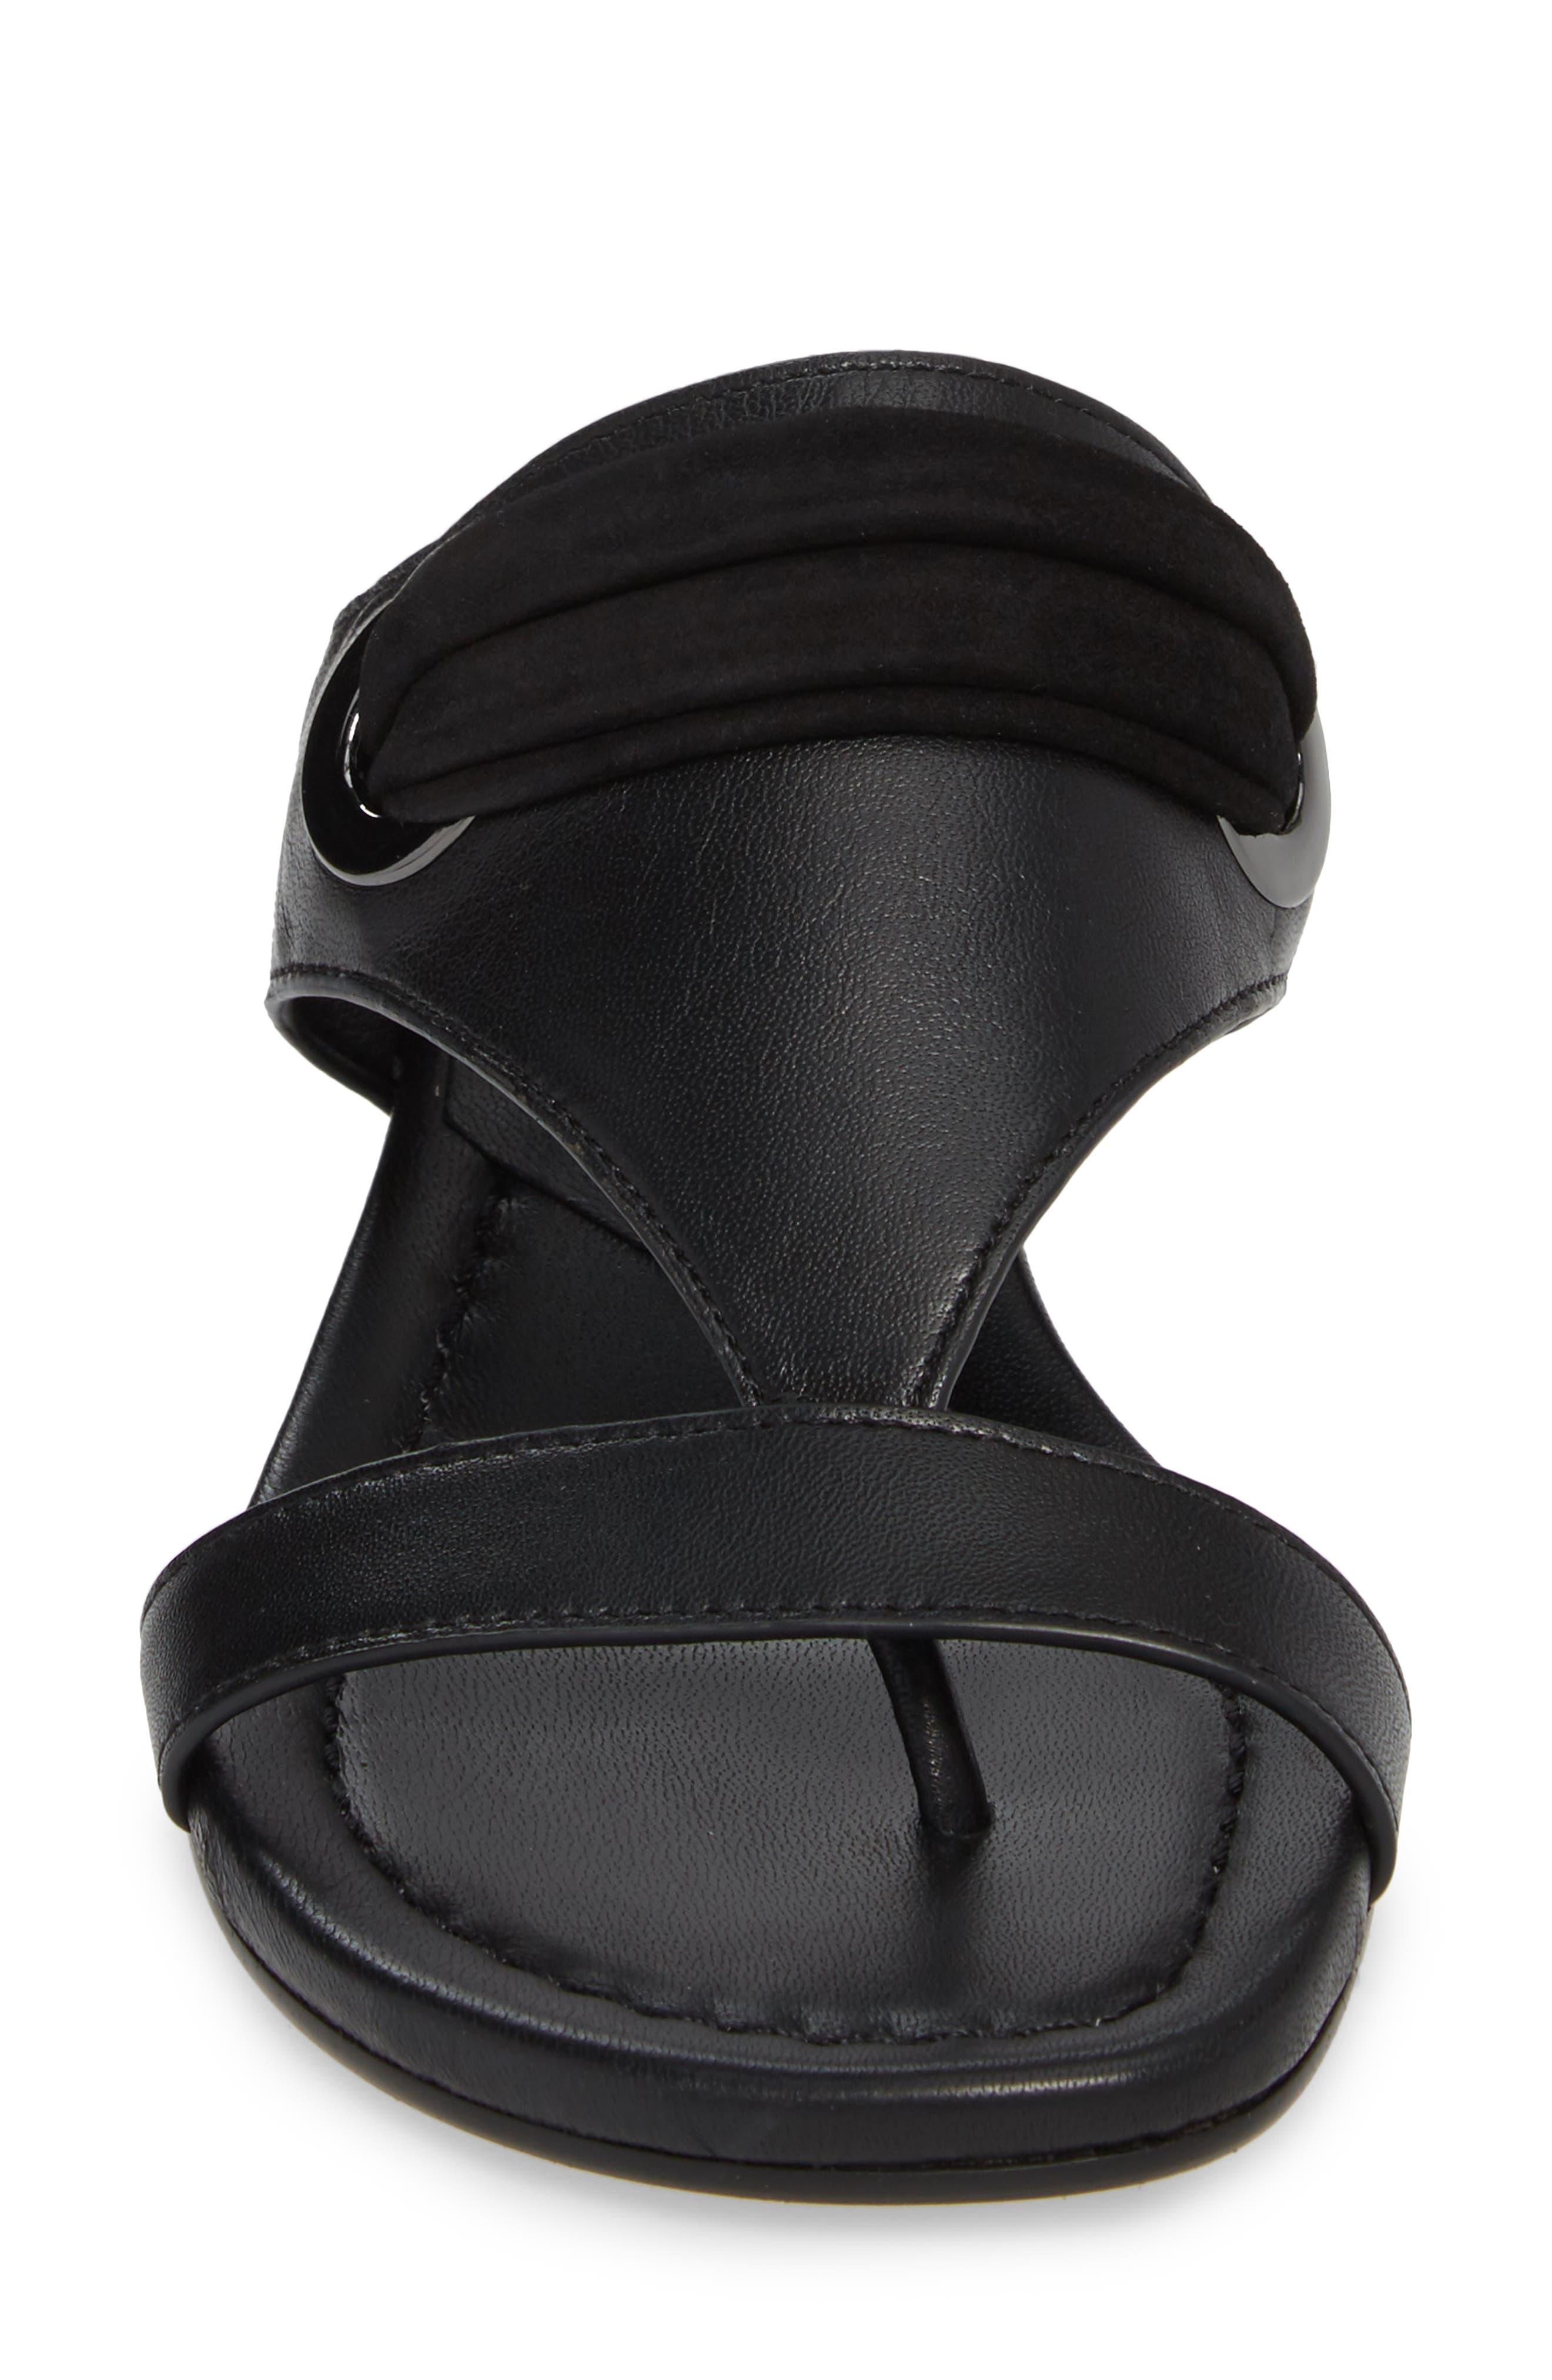 Dionne Wedge Sandal,                             Alternate thumbnail 4, color,                             Black Leather